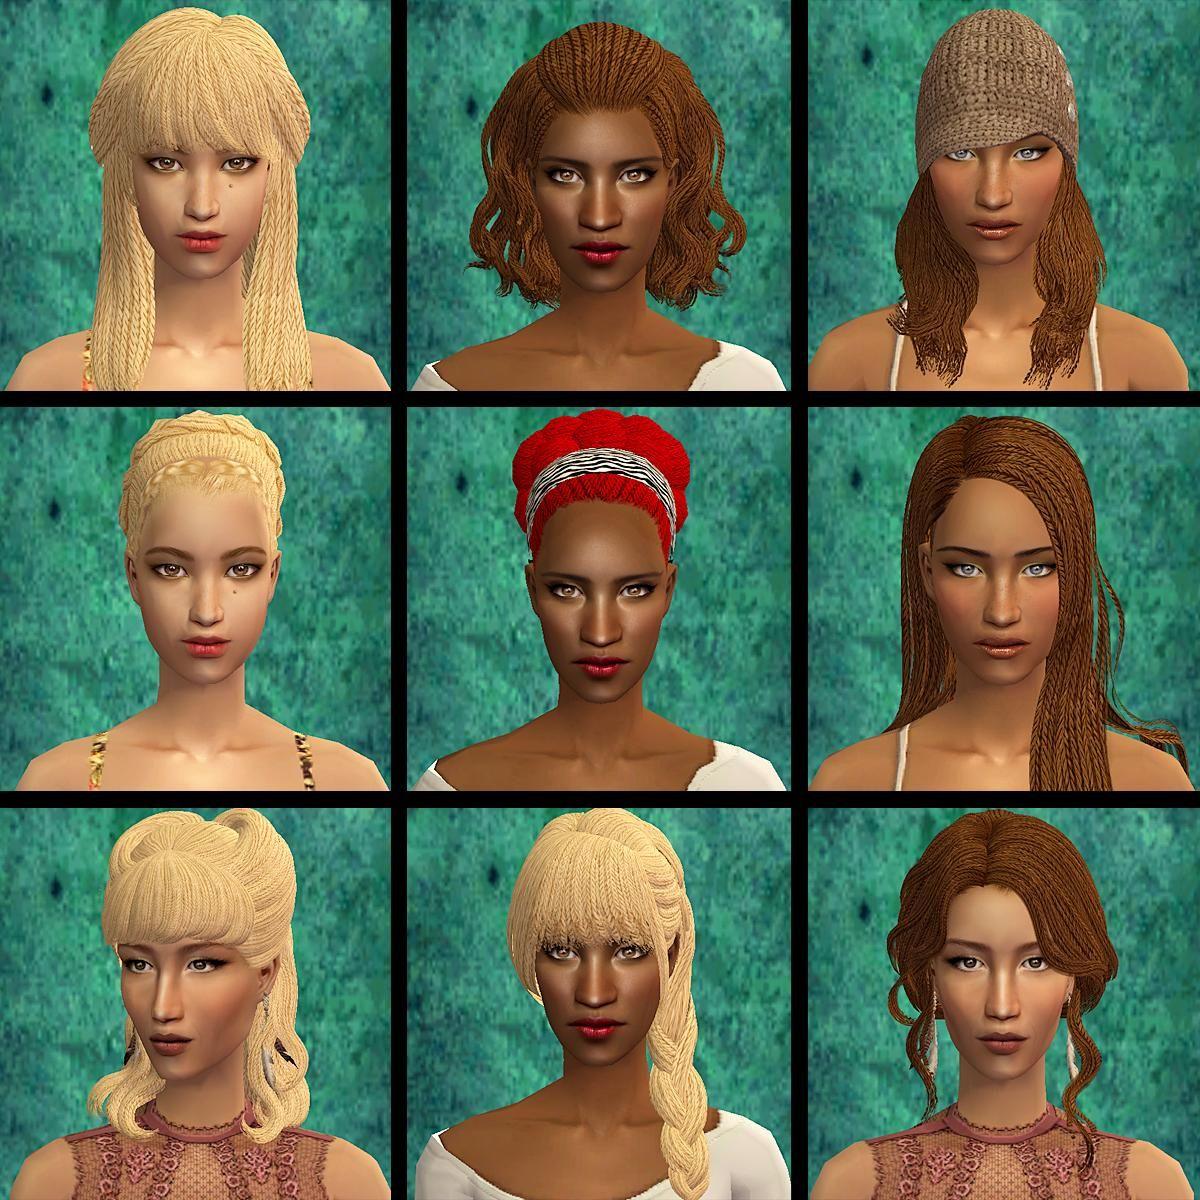 Sims 2 Hairstyles: Sims 2 Hair, Sims Hair, Sims